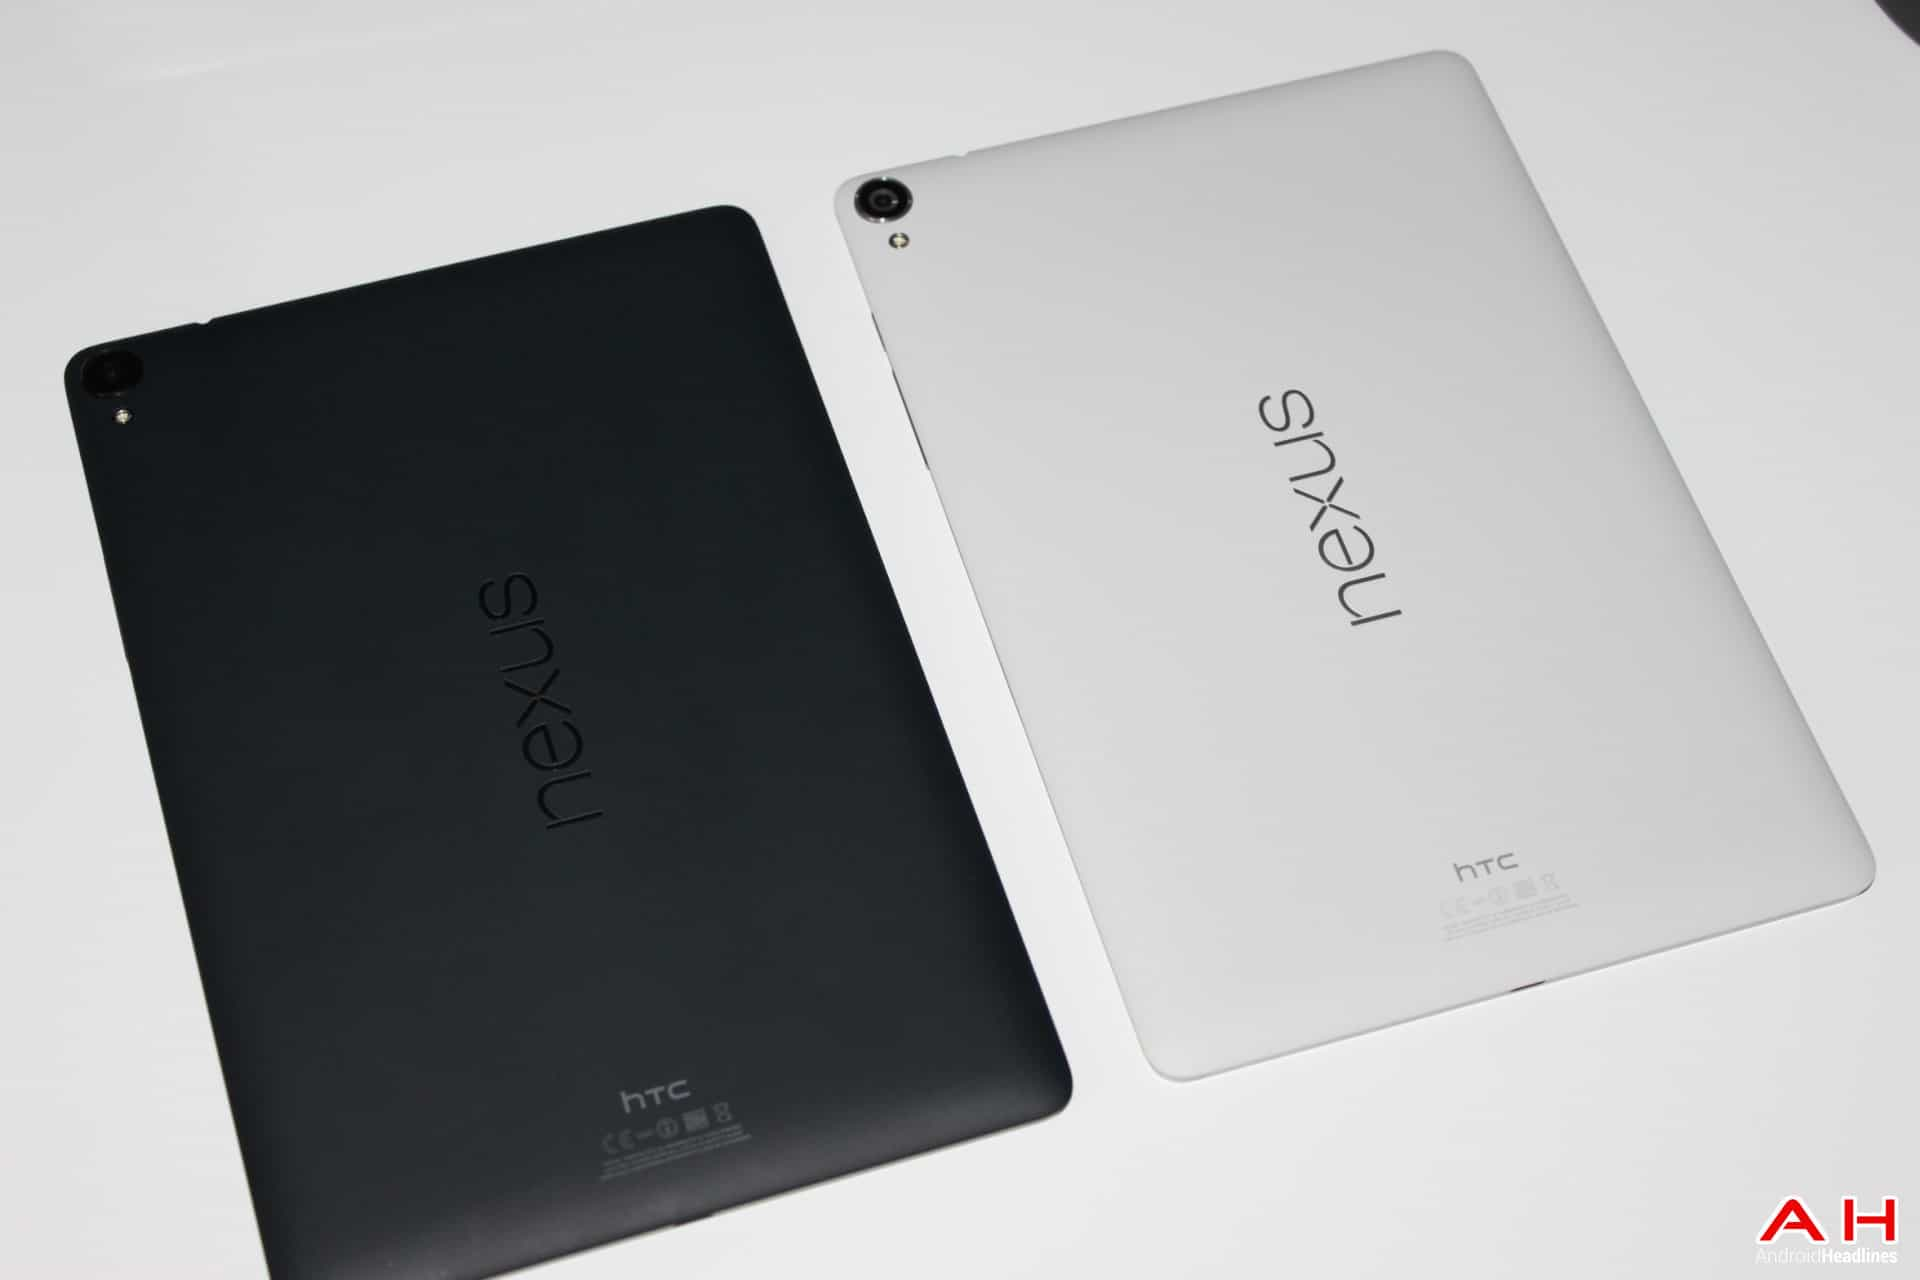 AH Nexus 9 - 5 back and white